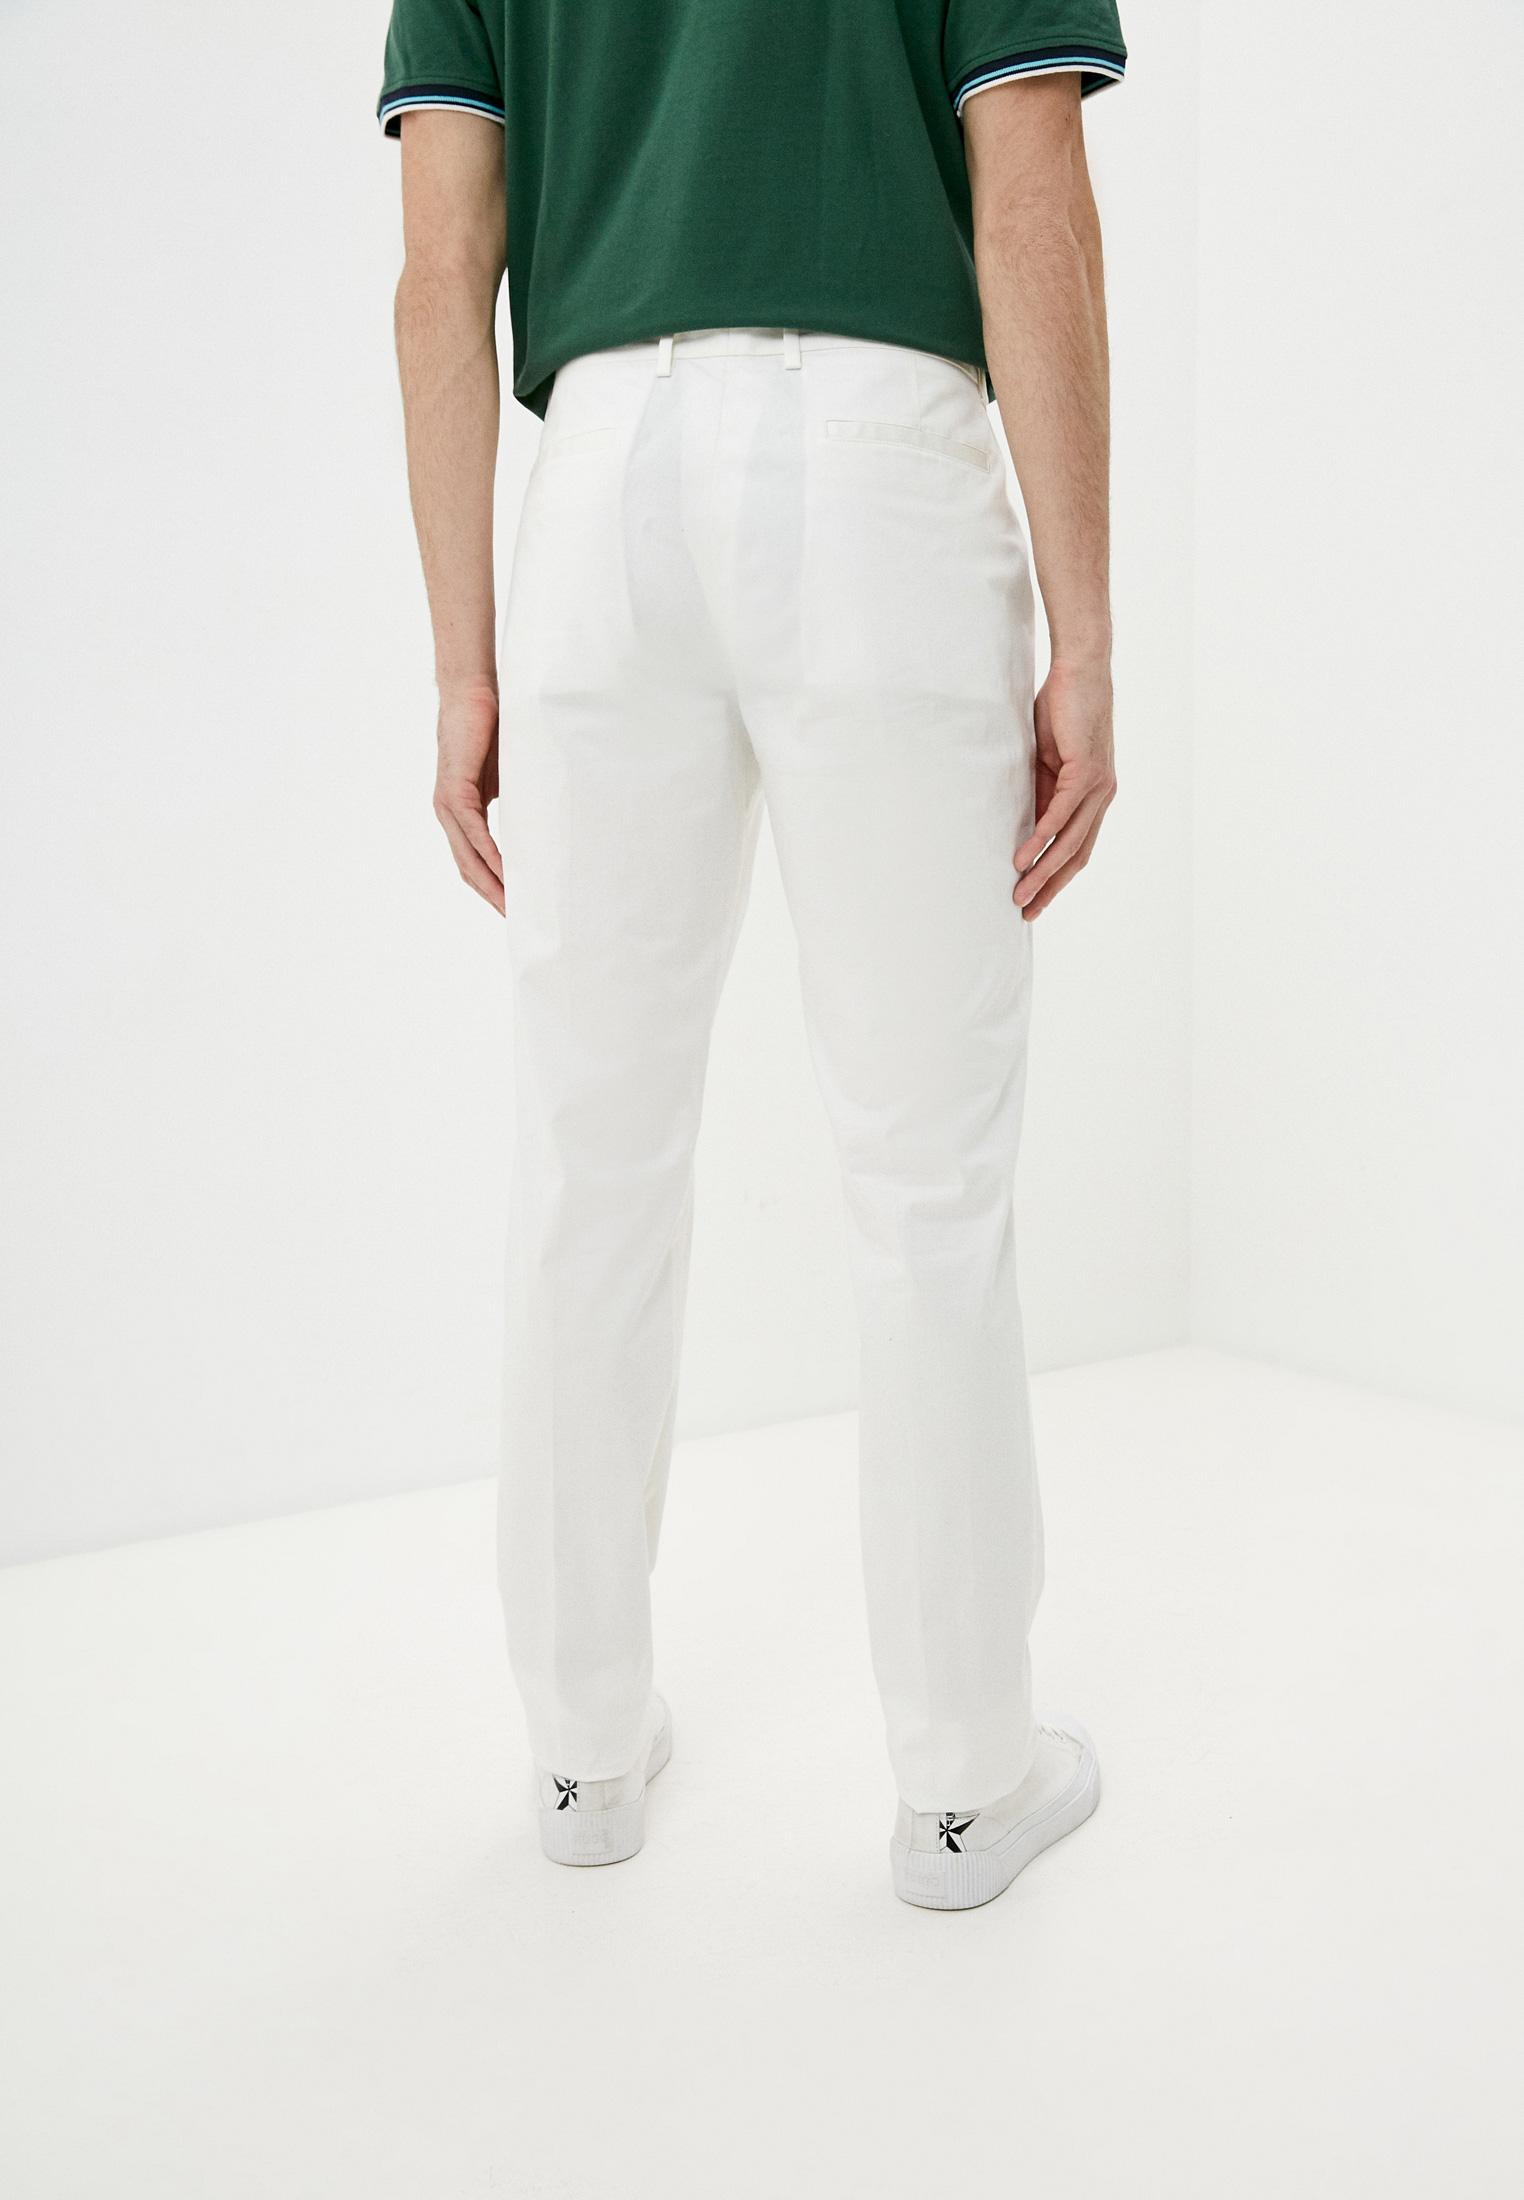 Мужские брюки Trussardi (Труссарди) 32P00110-1T091803: изображение 4